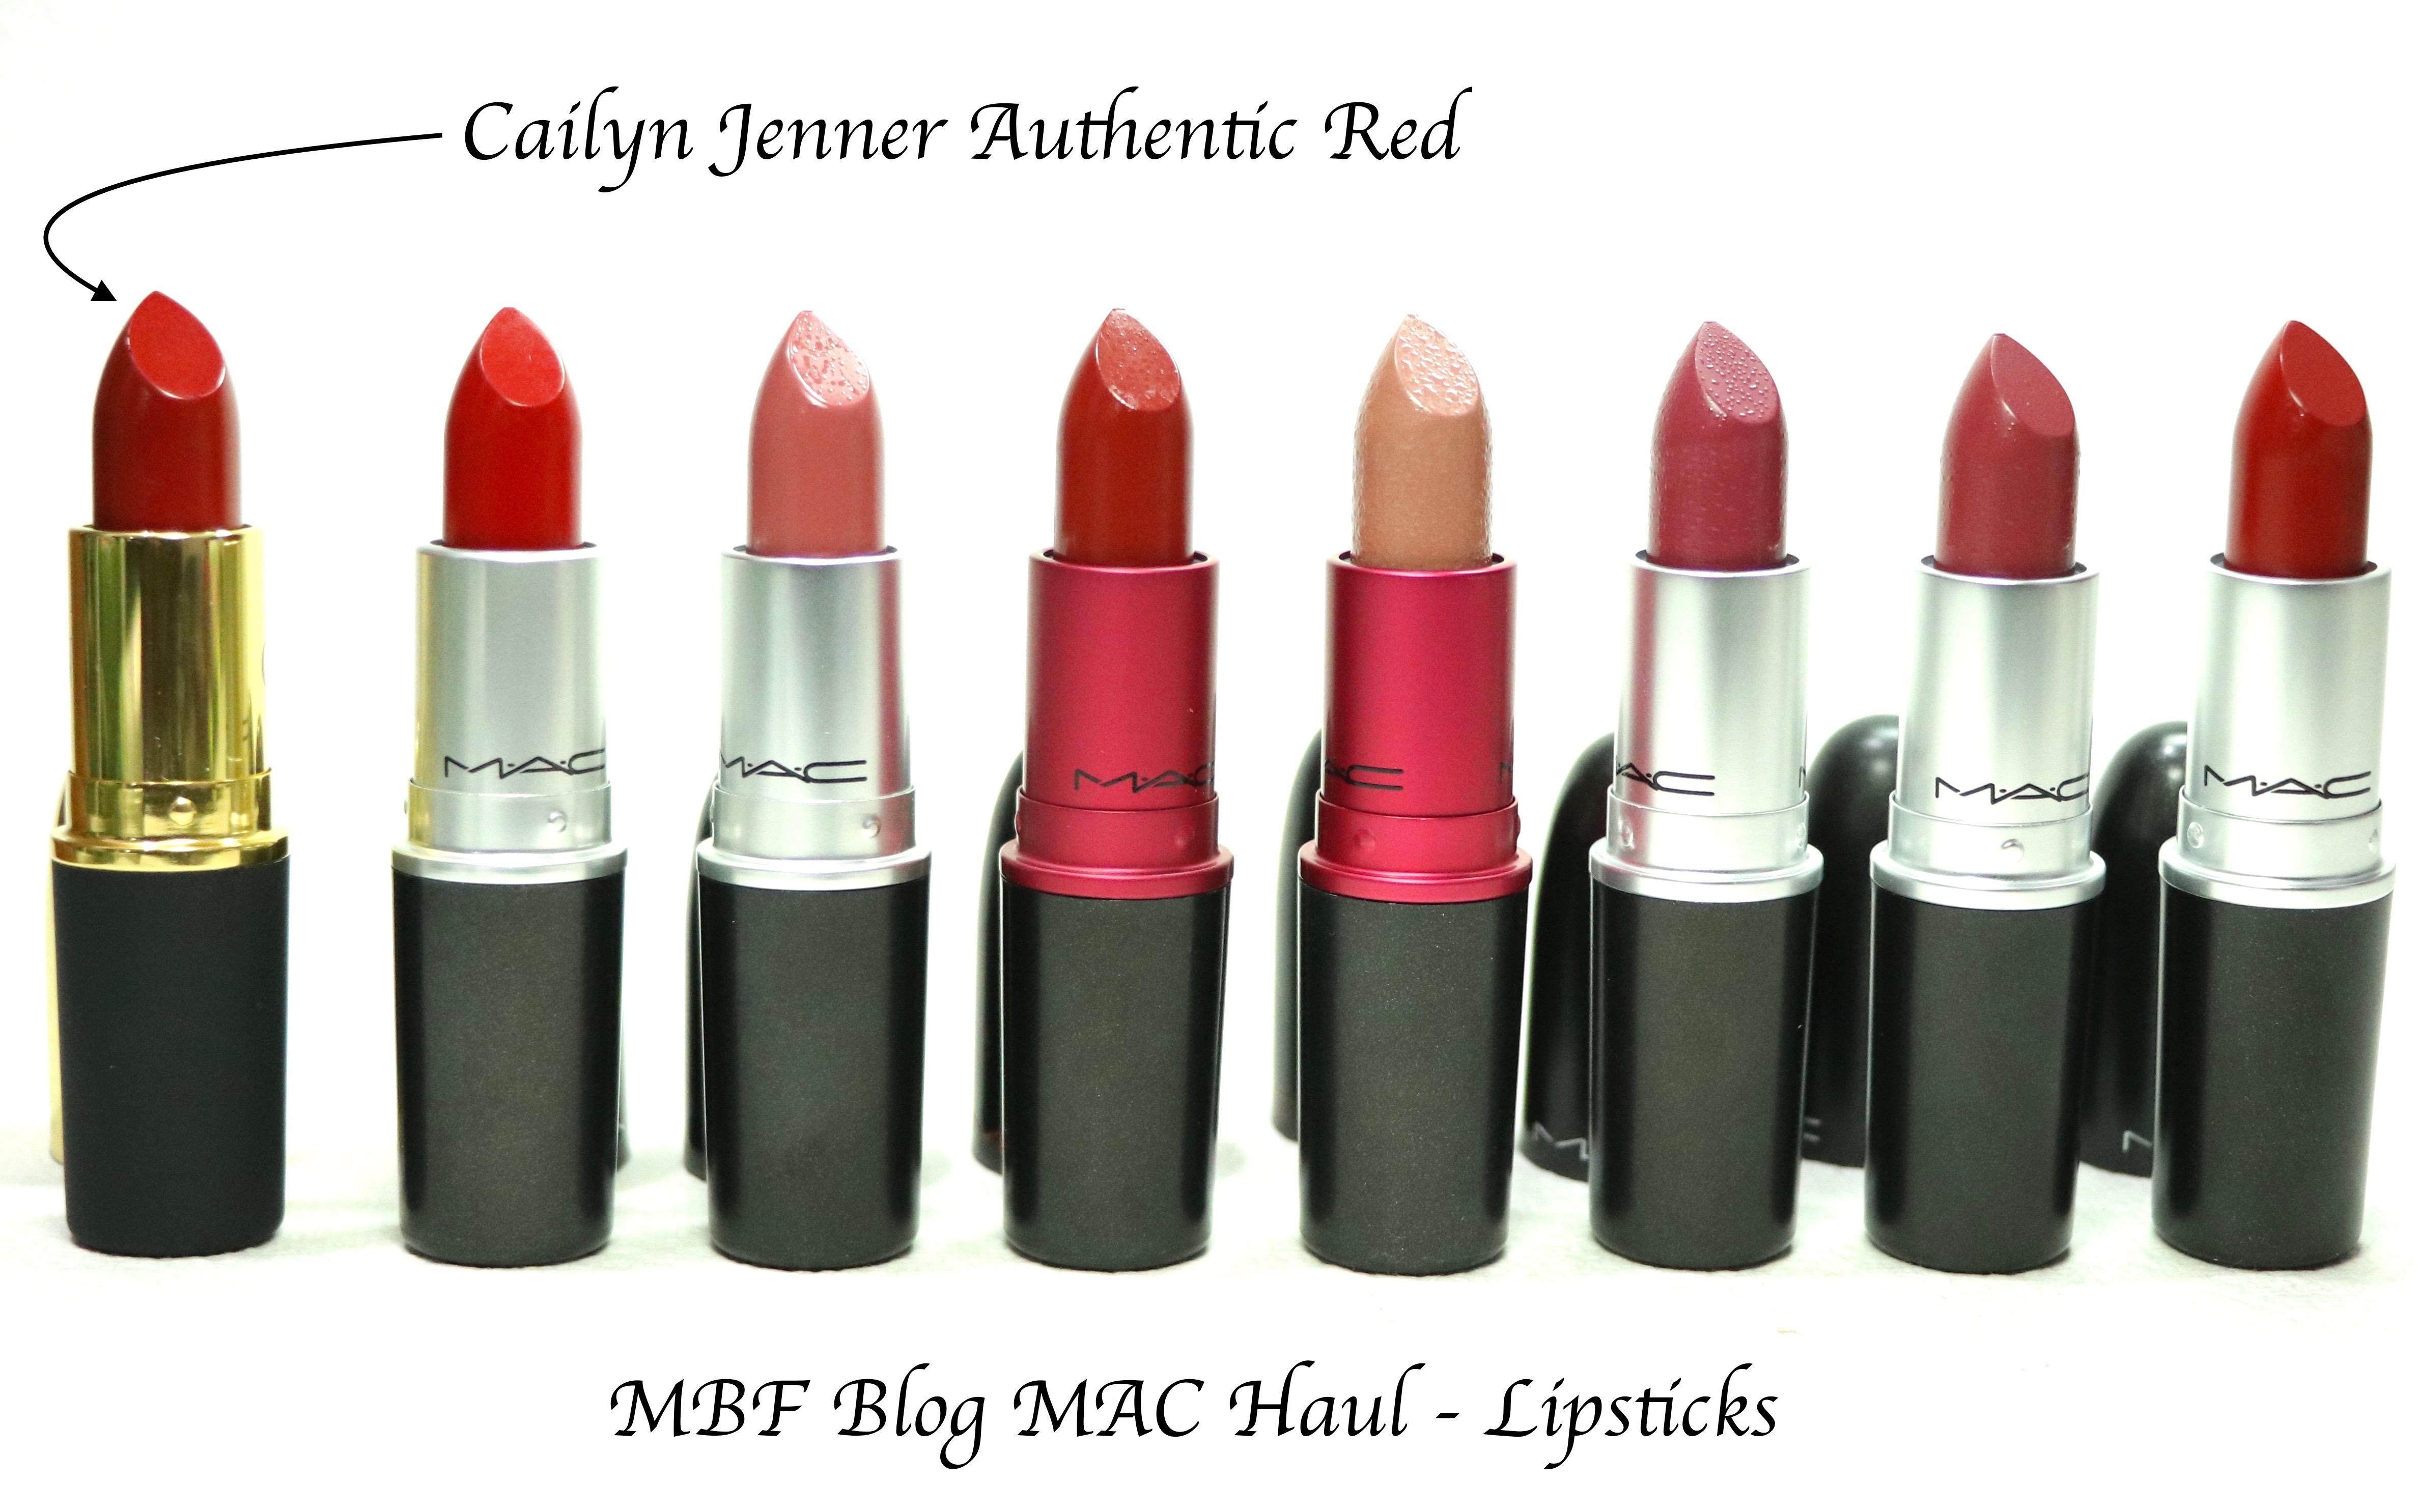 MAC Lipsticks Caitlyn Jenner Authentic Red, Ruby Woo, Mehr, Viva ...